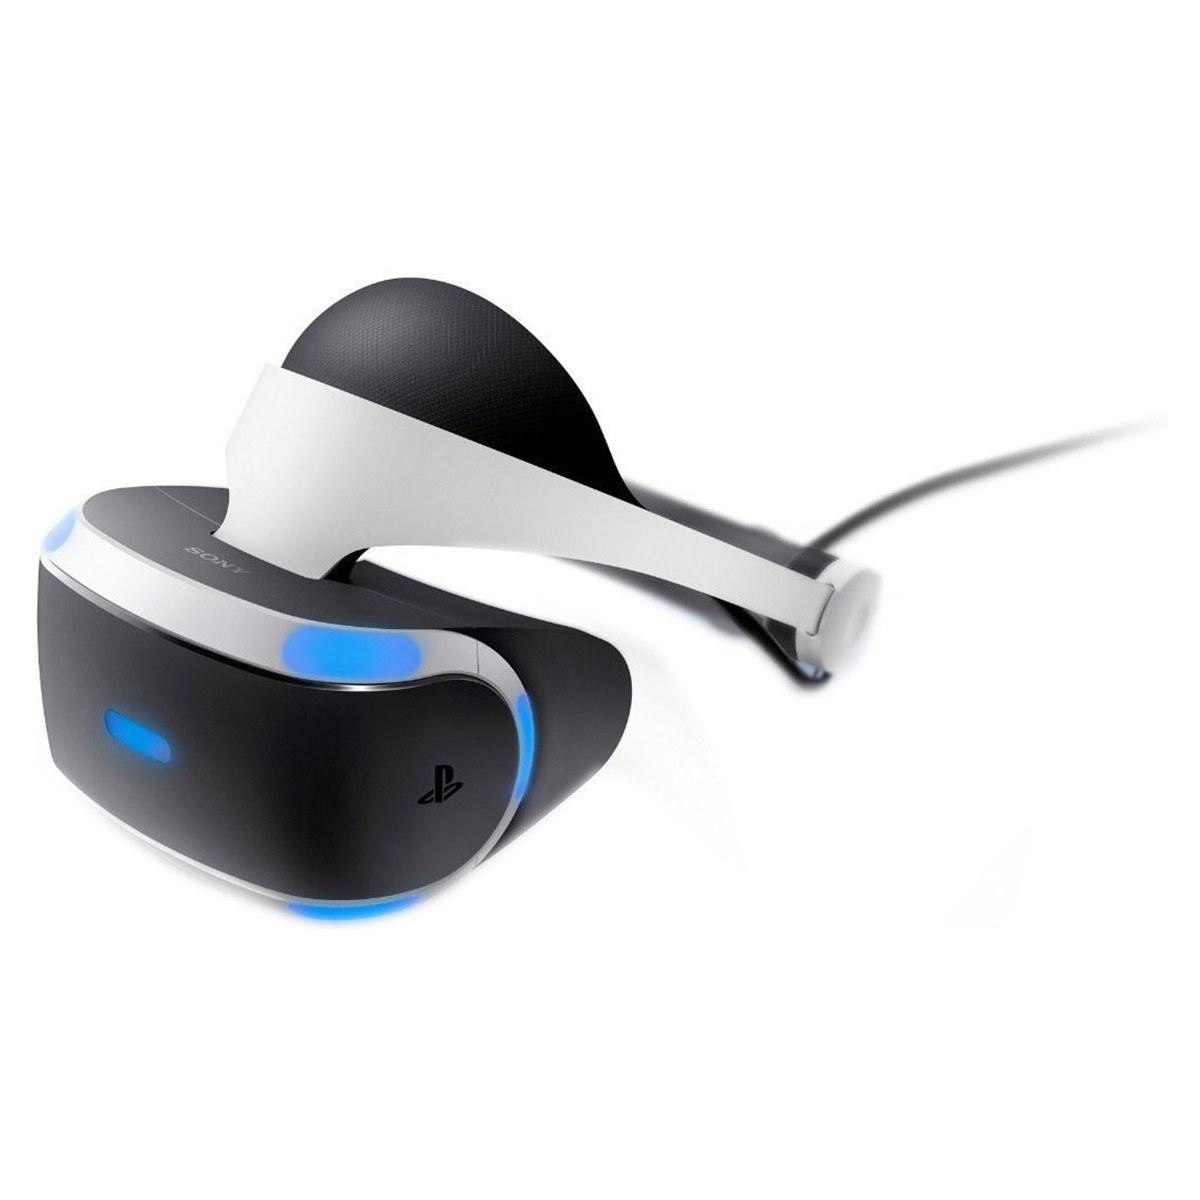 عکس باندل واقعیت مجازی سونی مدل PlayStation VR Sony PlayStation VR Bundle باندل-واقعیت-مجازی-سونی-مدل-playstation-vr